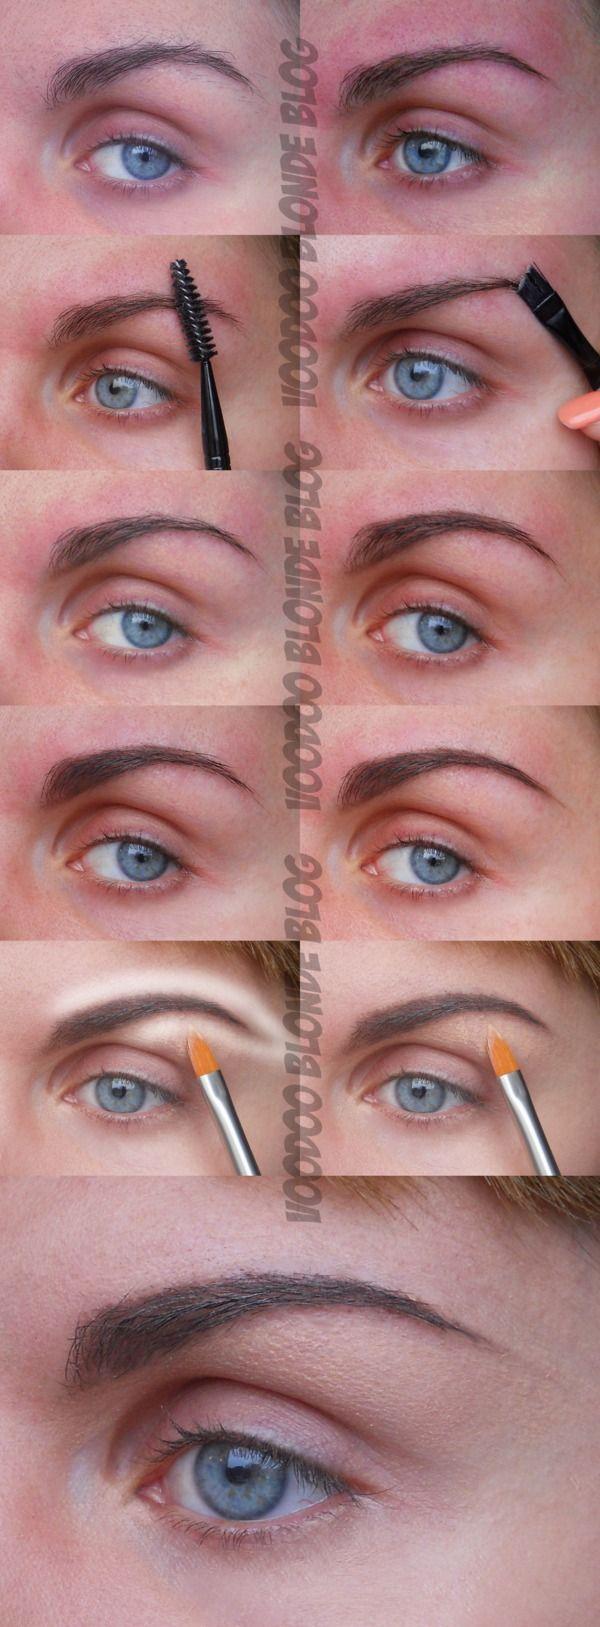 Eyebrow tutorial step-by-step | Beautiful eyebrows ...